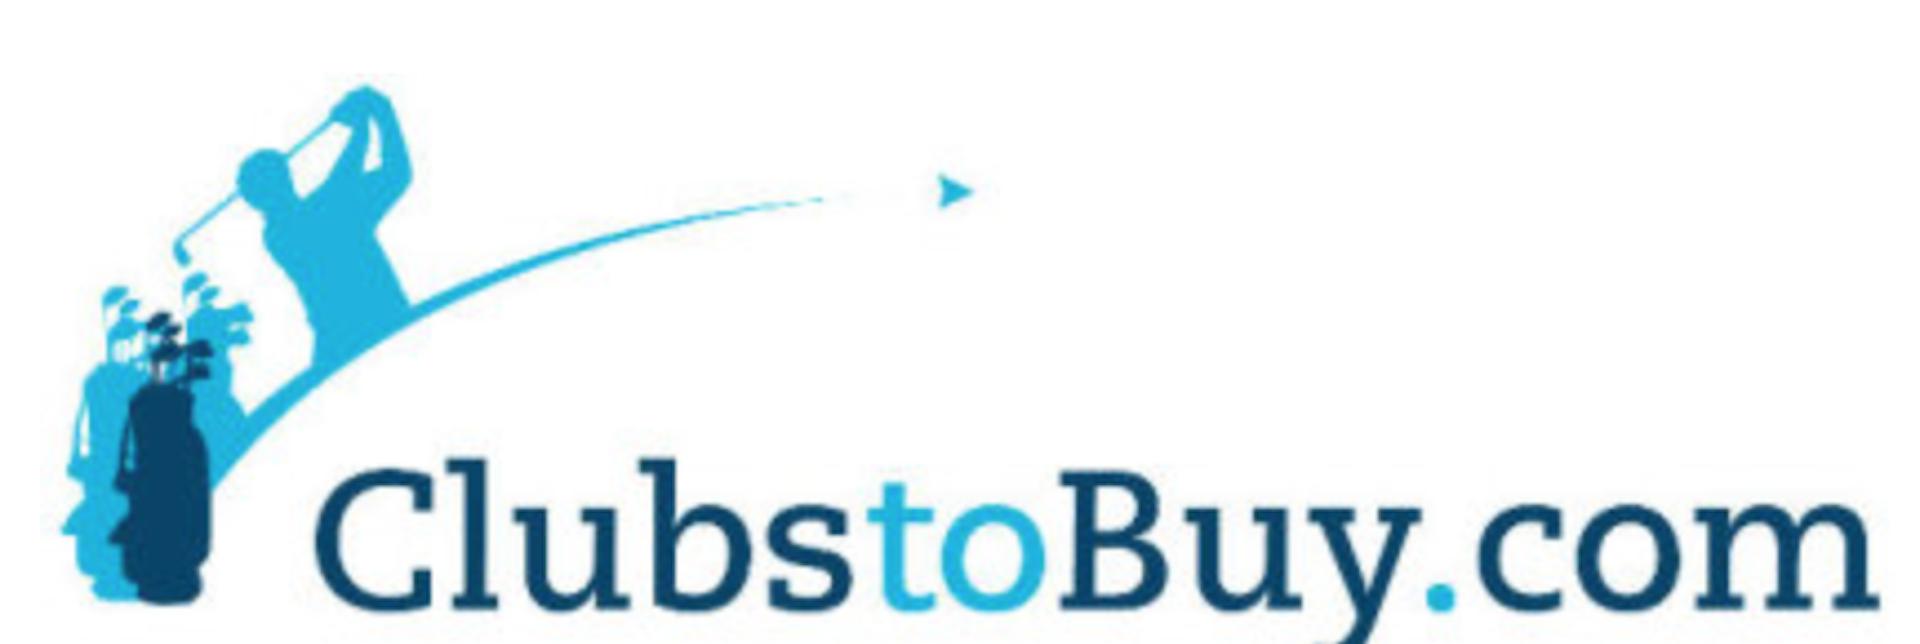 Clubstohire.com launches clubstobuy.com